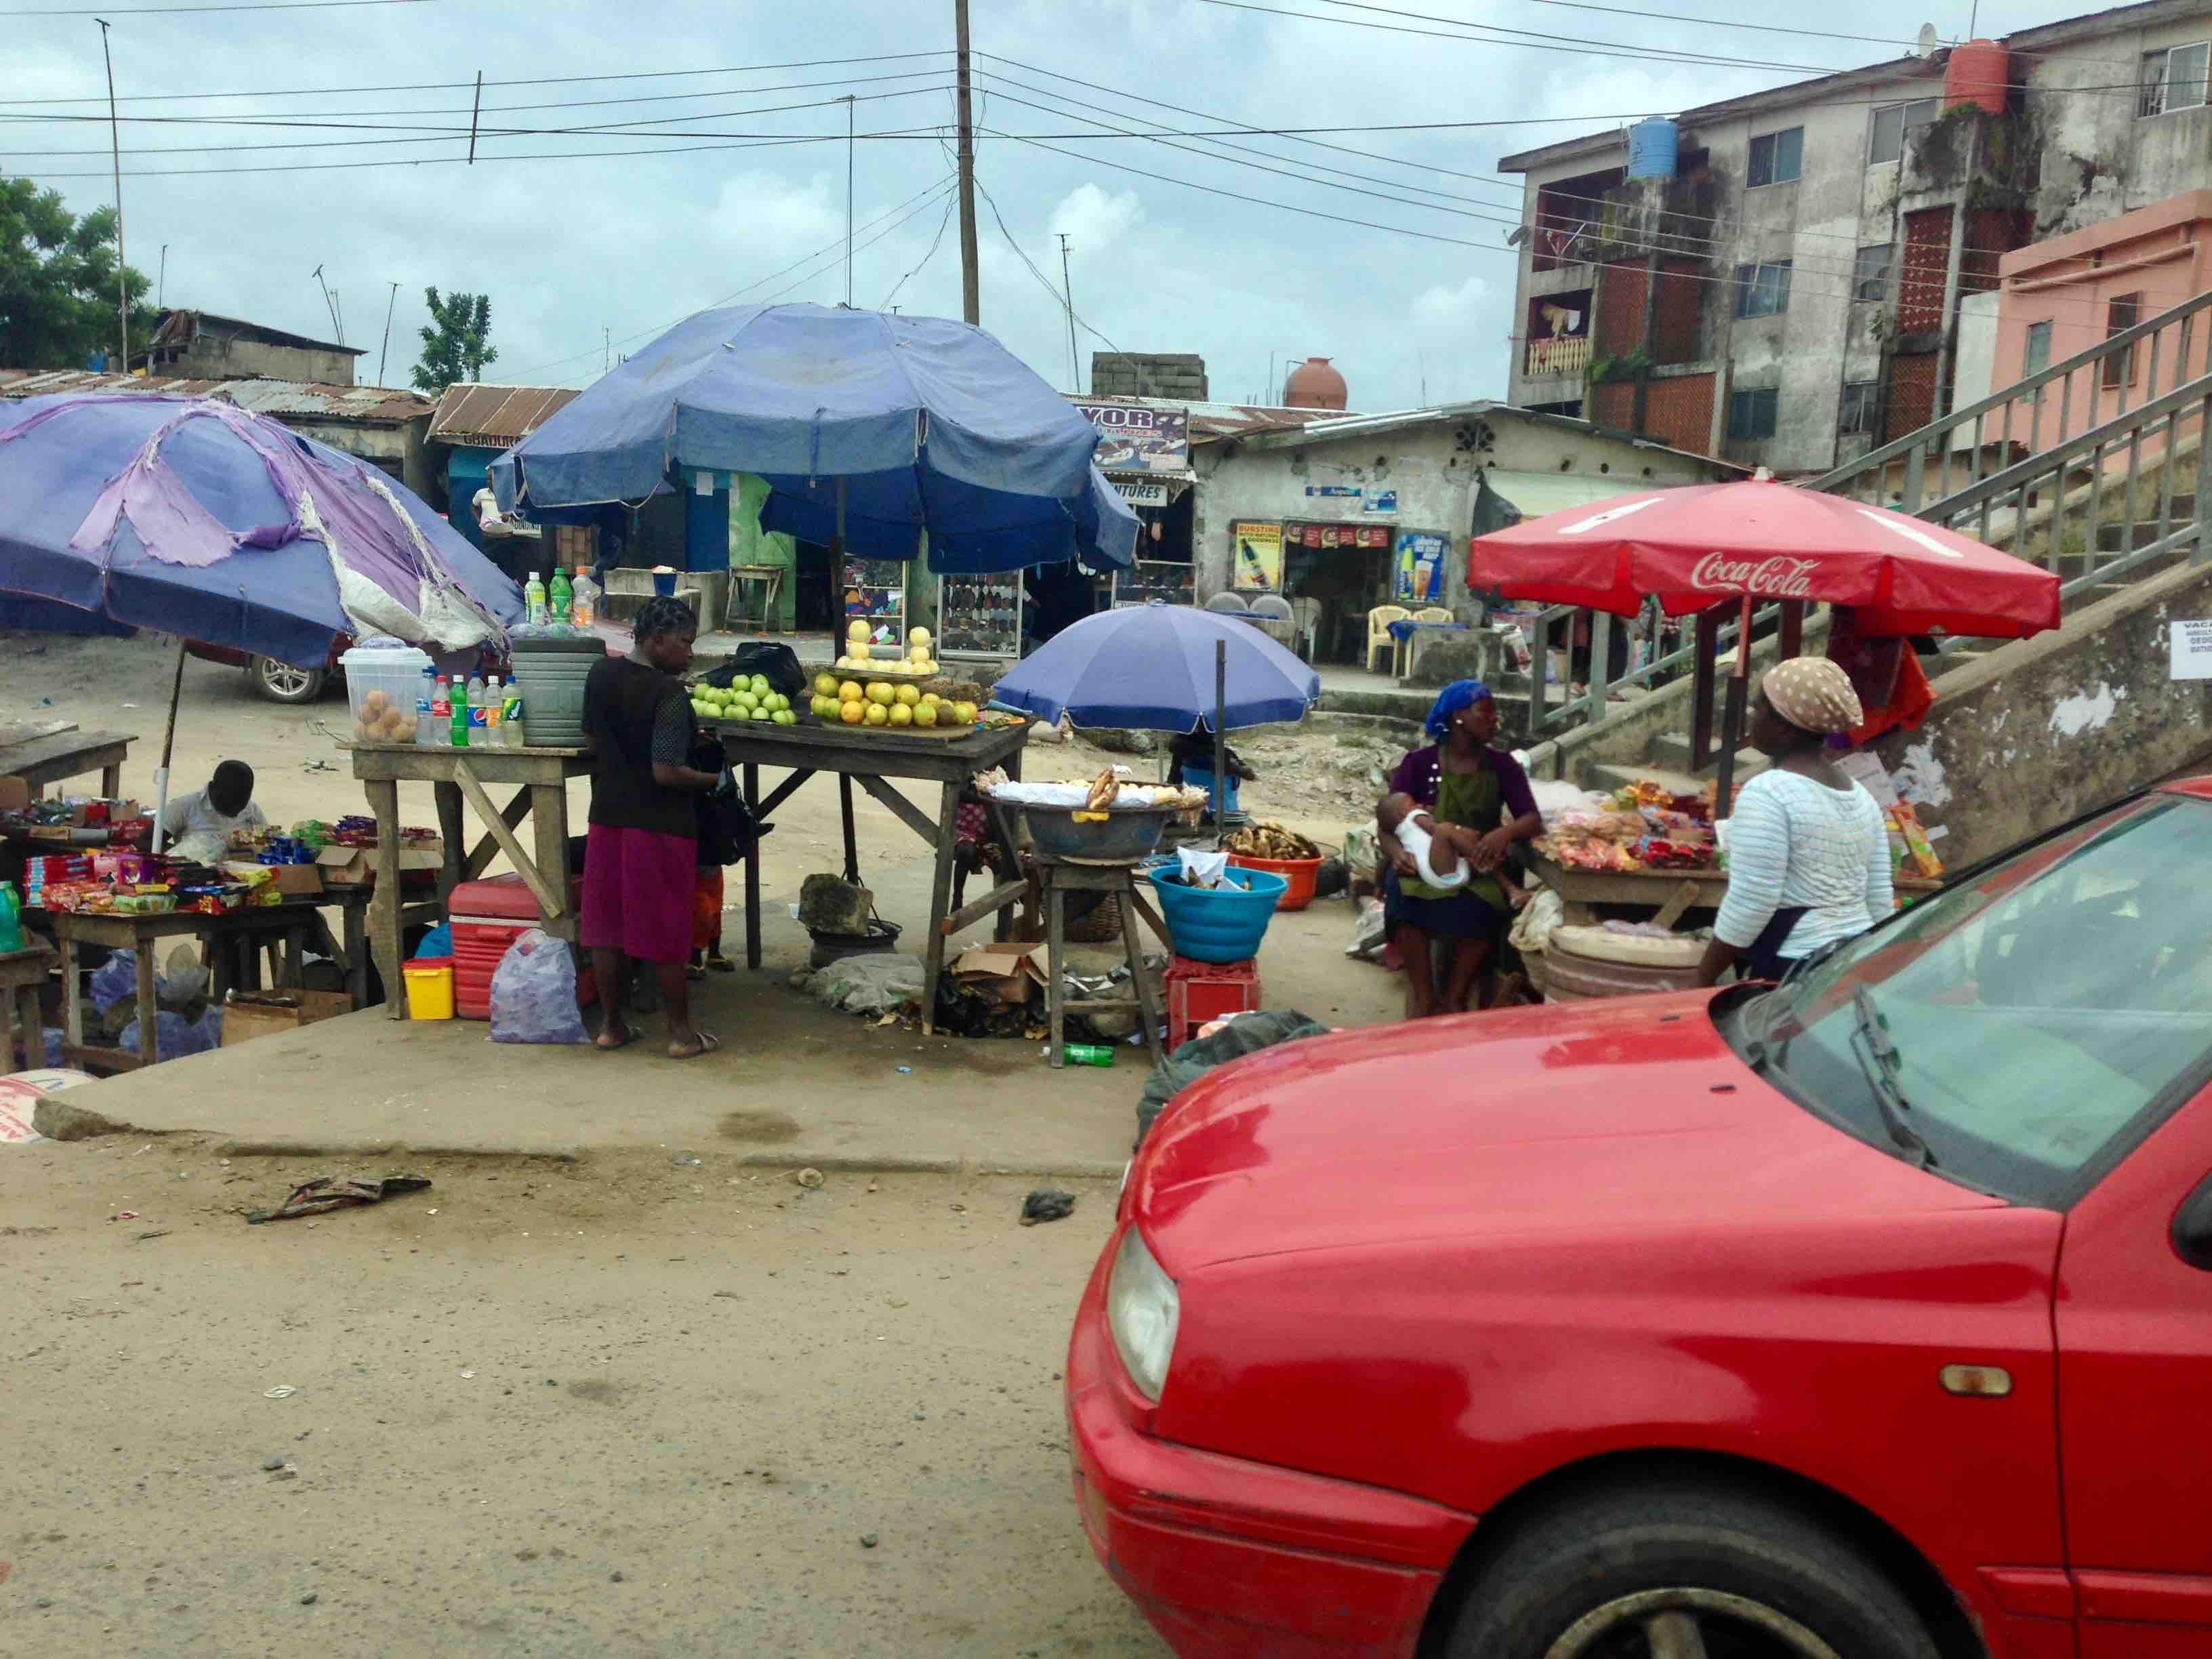 Street Market Scene, Lagos - Badagry Expressway, Lagos State, Nigeria. #JujuFilms